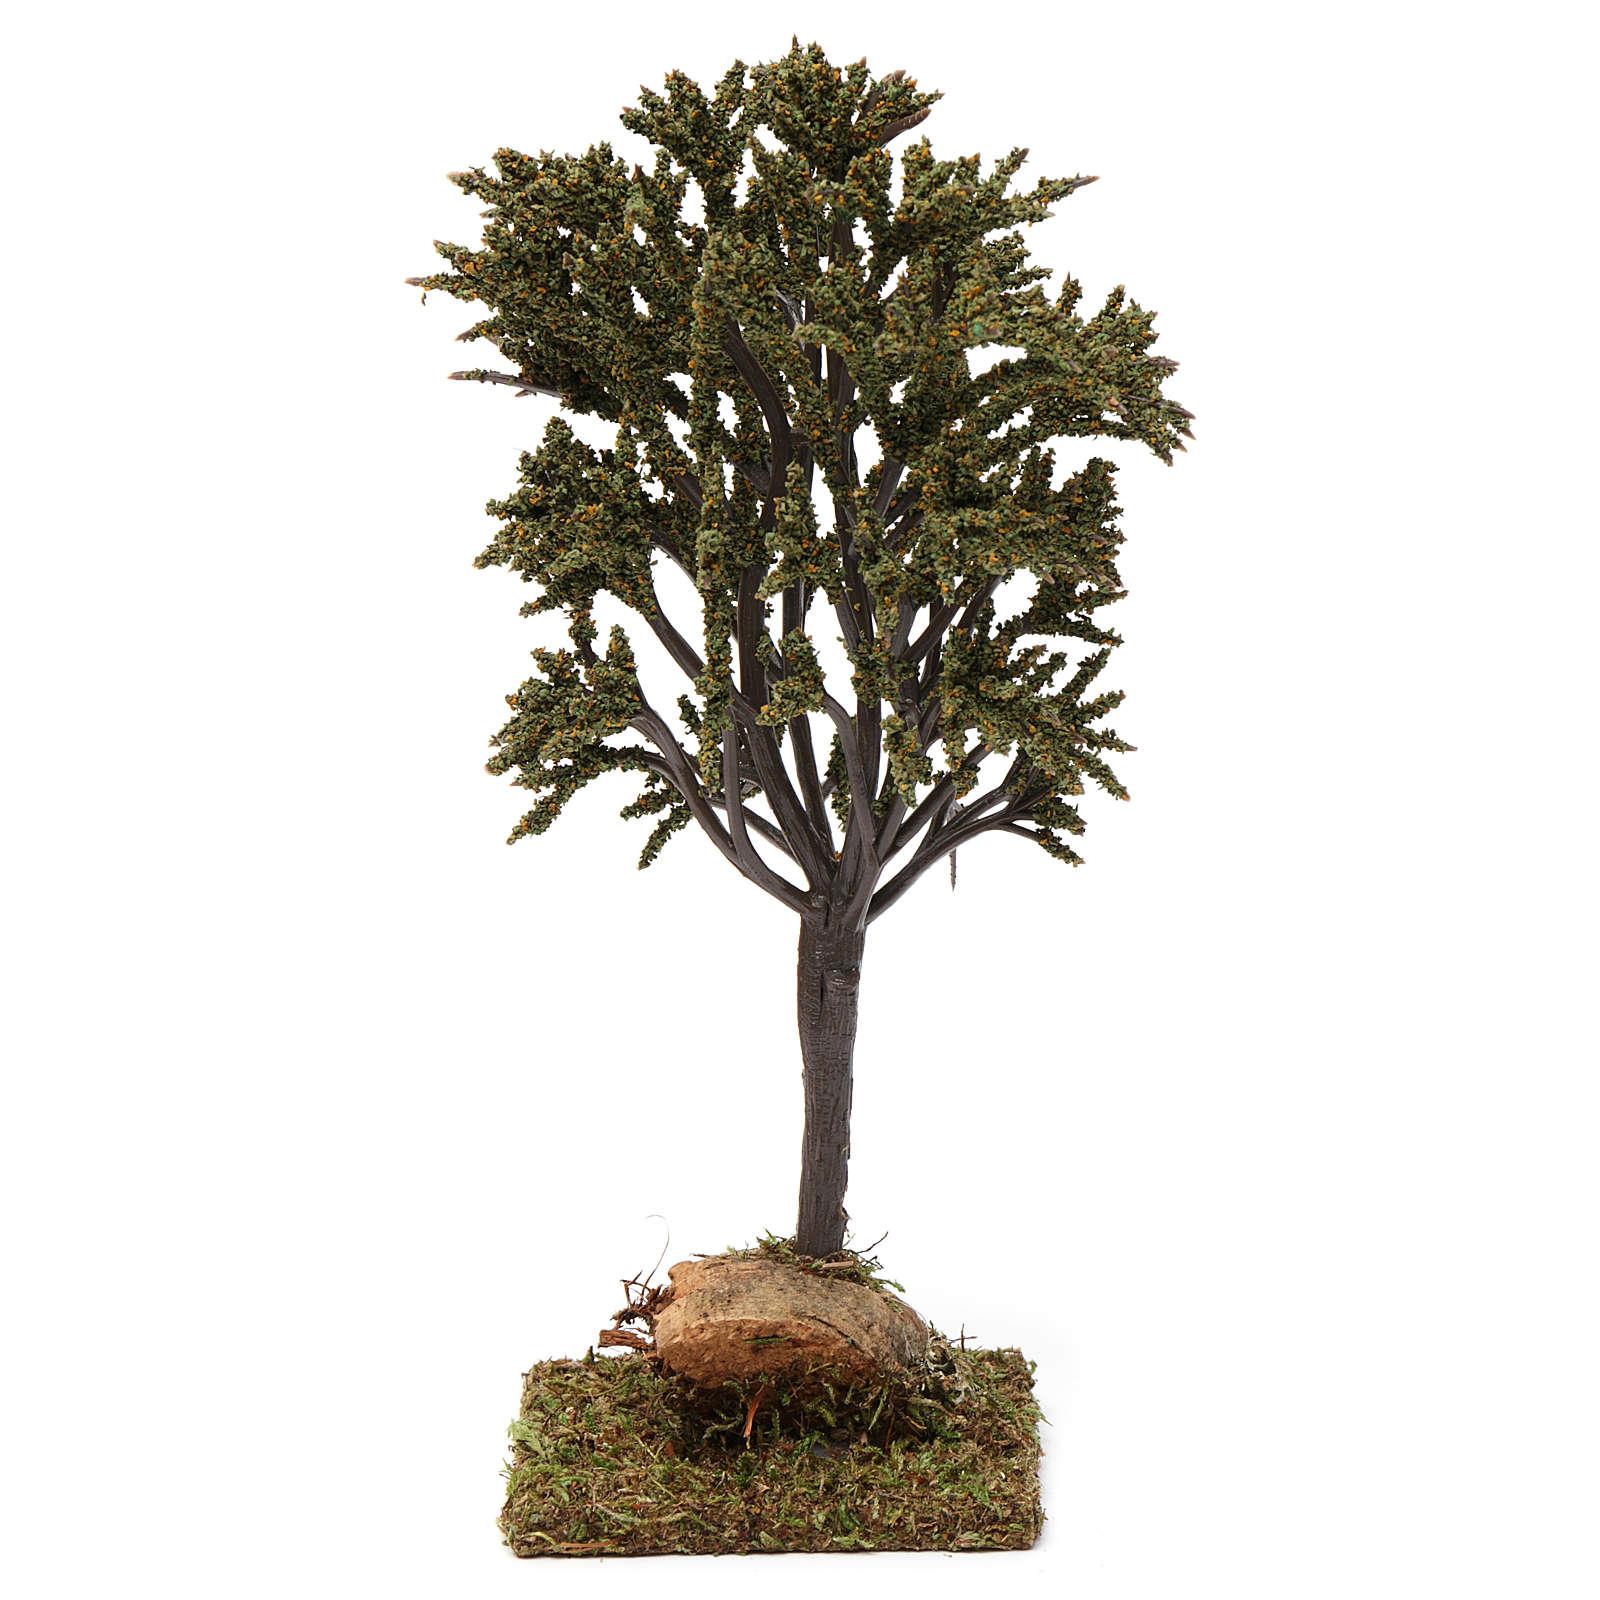 Albero verde ramificato per presepe 7-10 cm 4